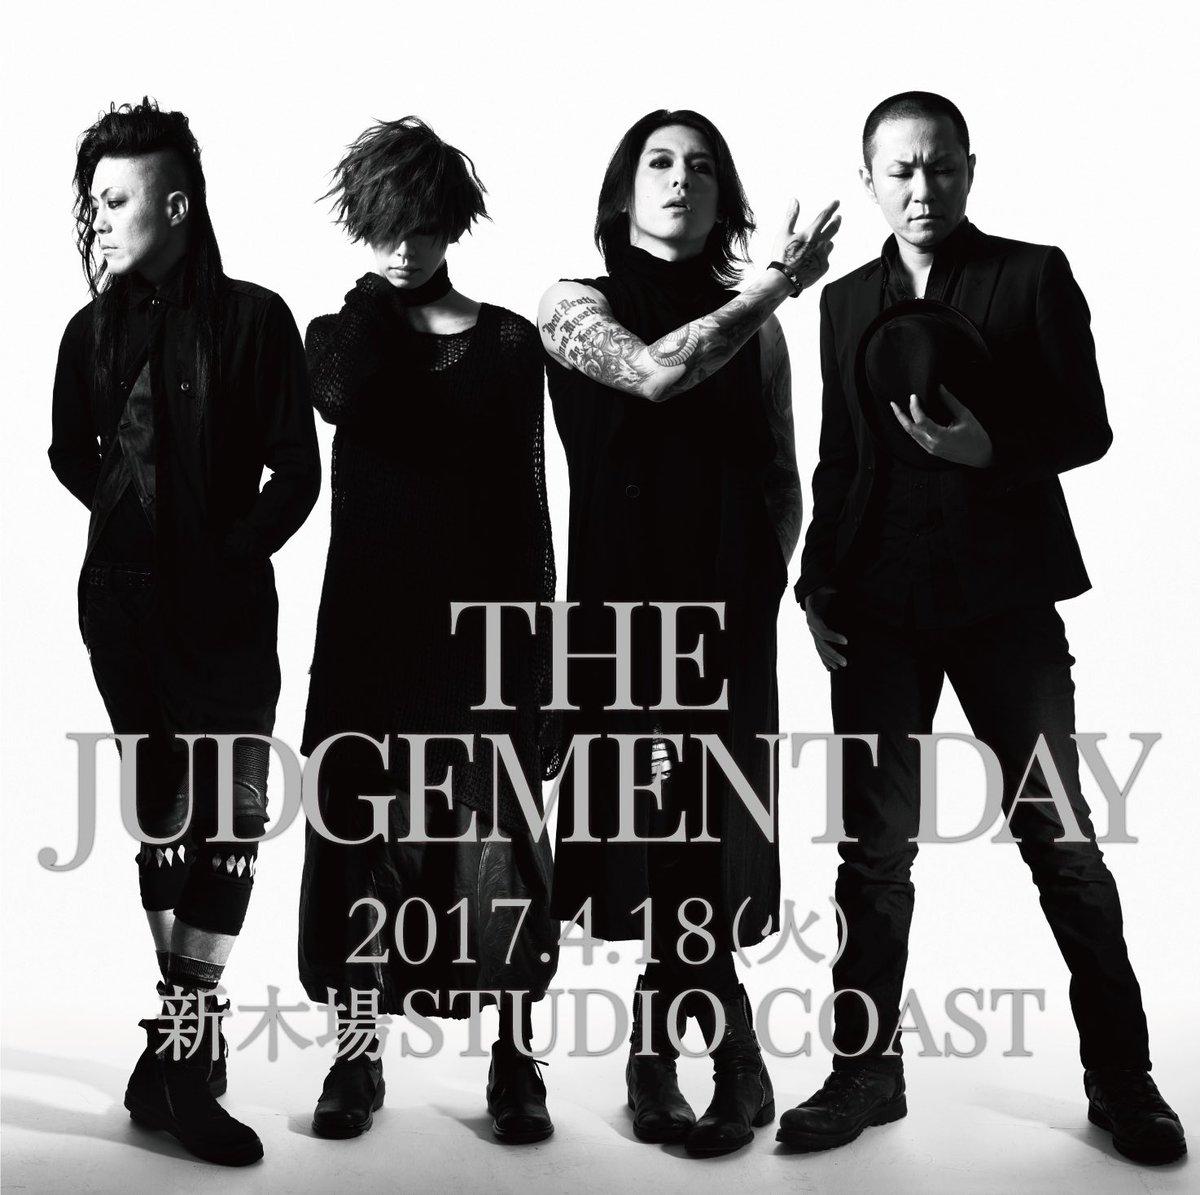 【H.P更新情報】 オフィシャルホームページにて  ▪️新アーティスト写真 ▪️「THE JUDGE…